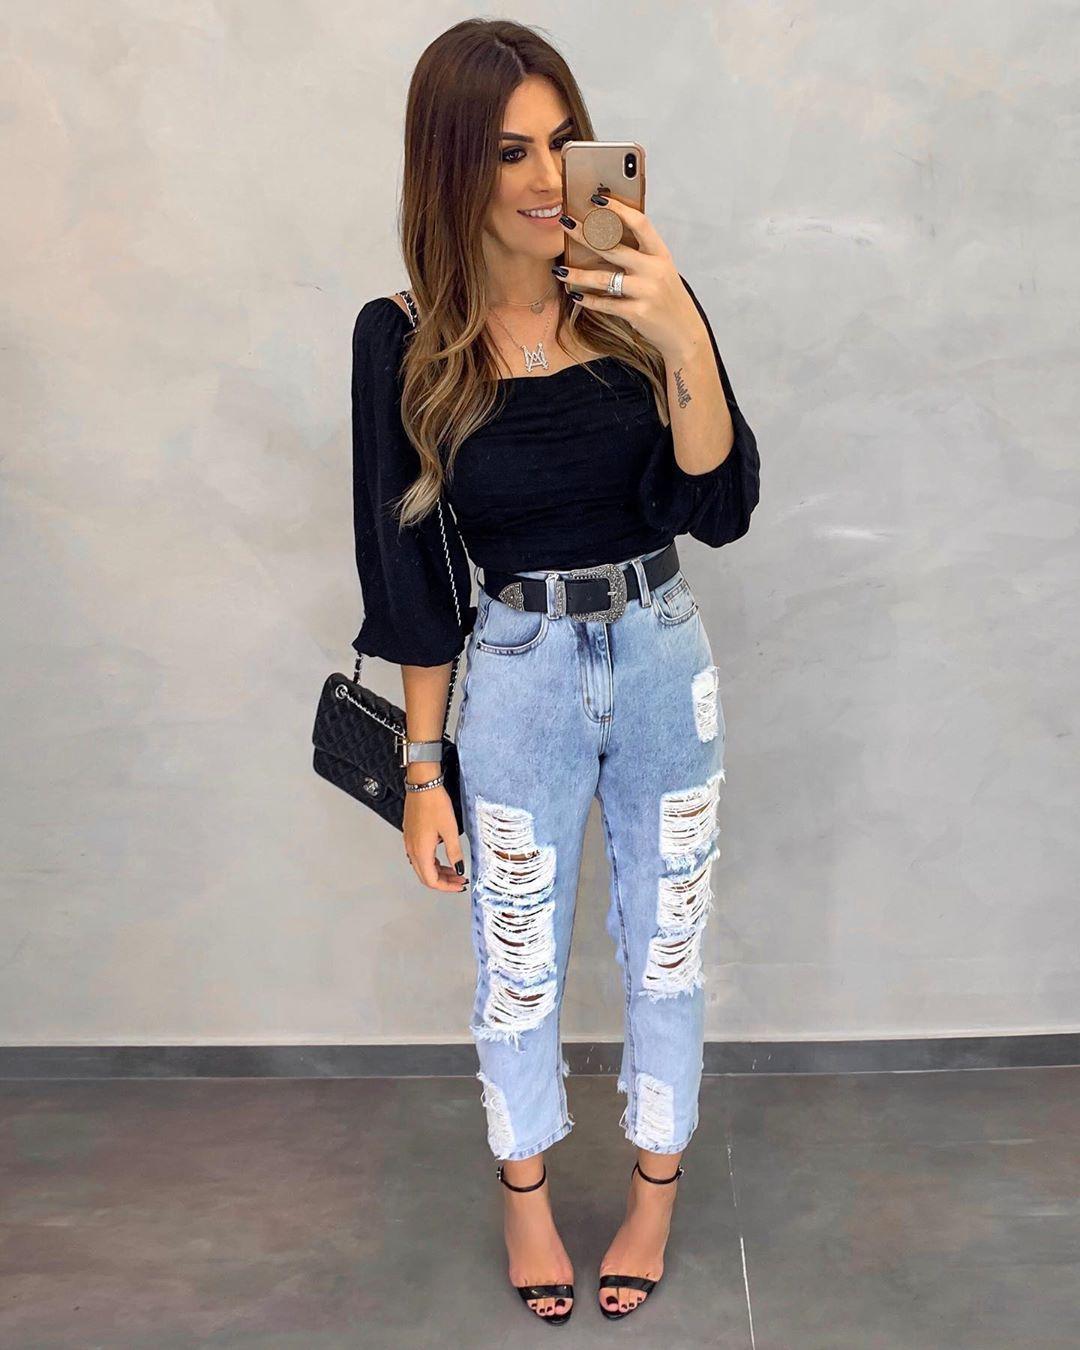 Calca Jeans Vintage Damaged Estacao Store